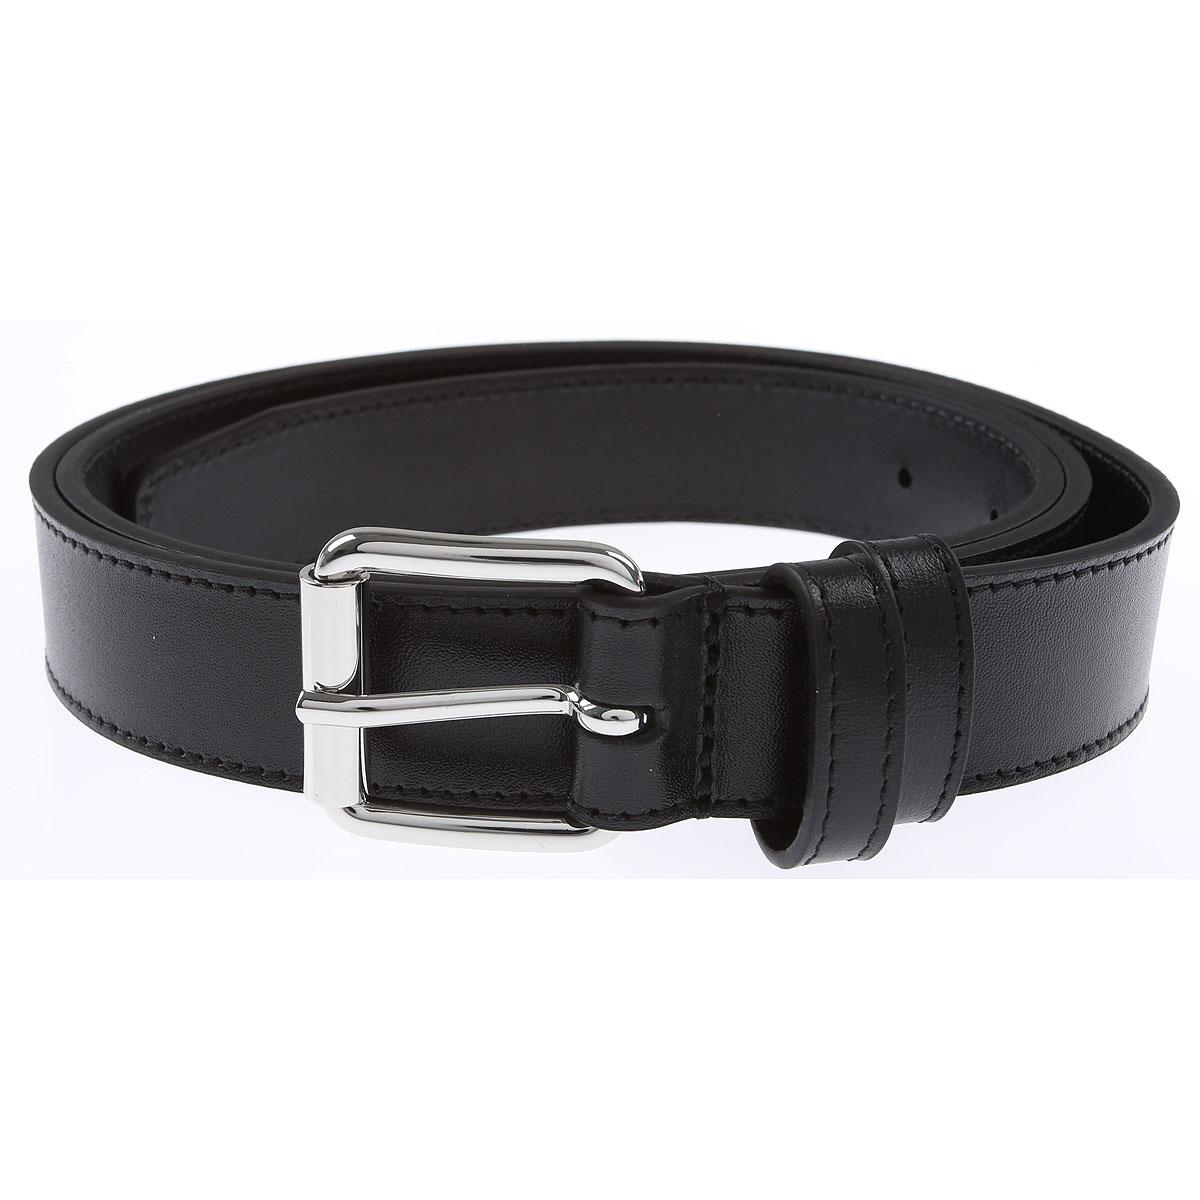 Comme des Garcons Mens Belts On Sale, Black, Leather, 2019